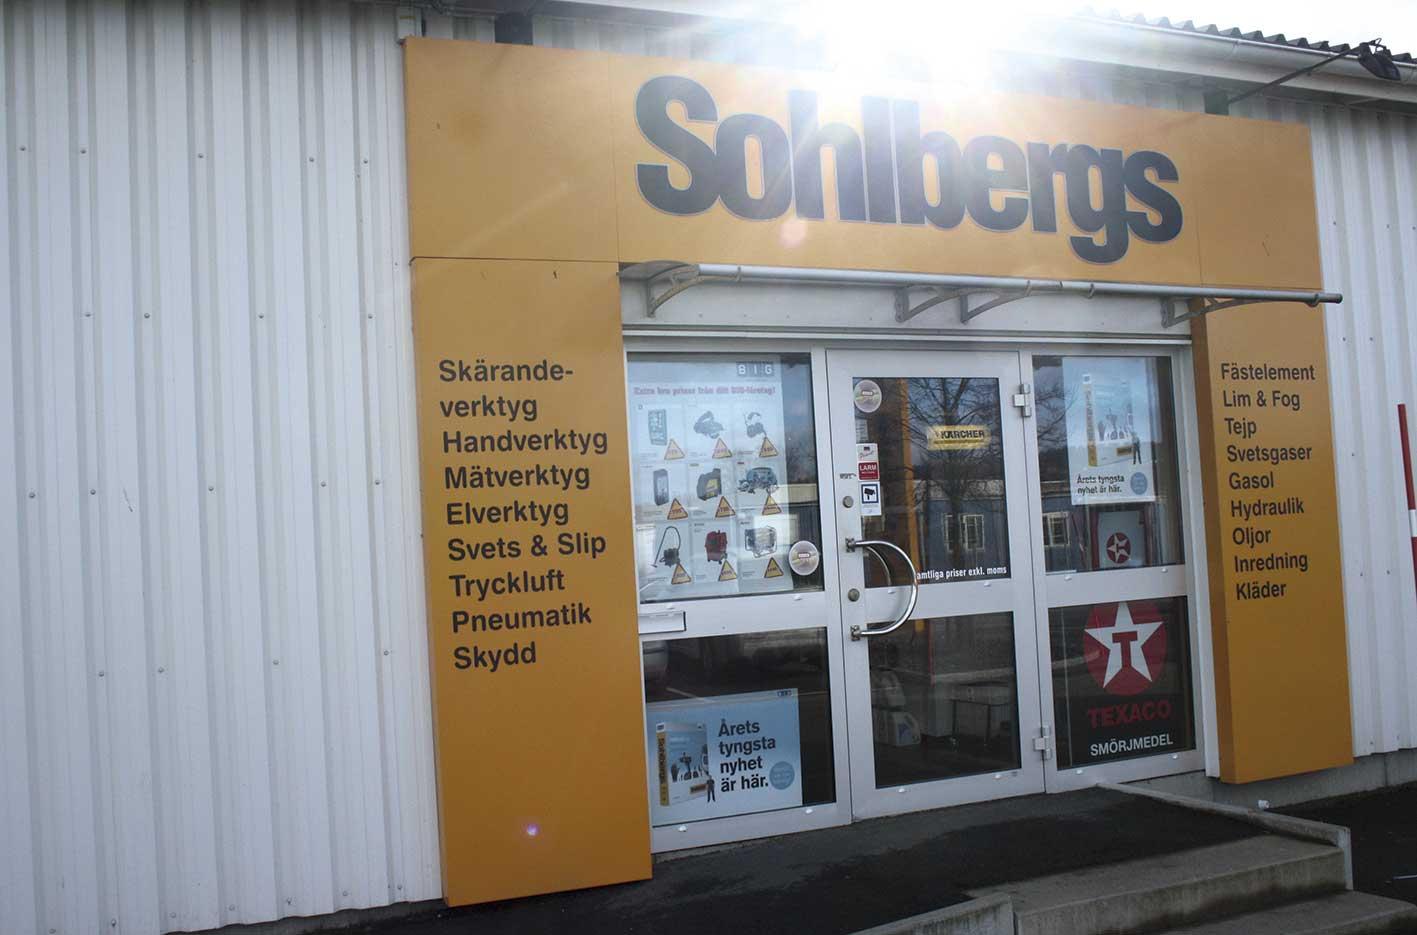 sohlbergs_img_6668